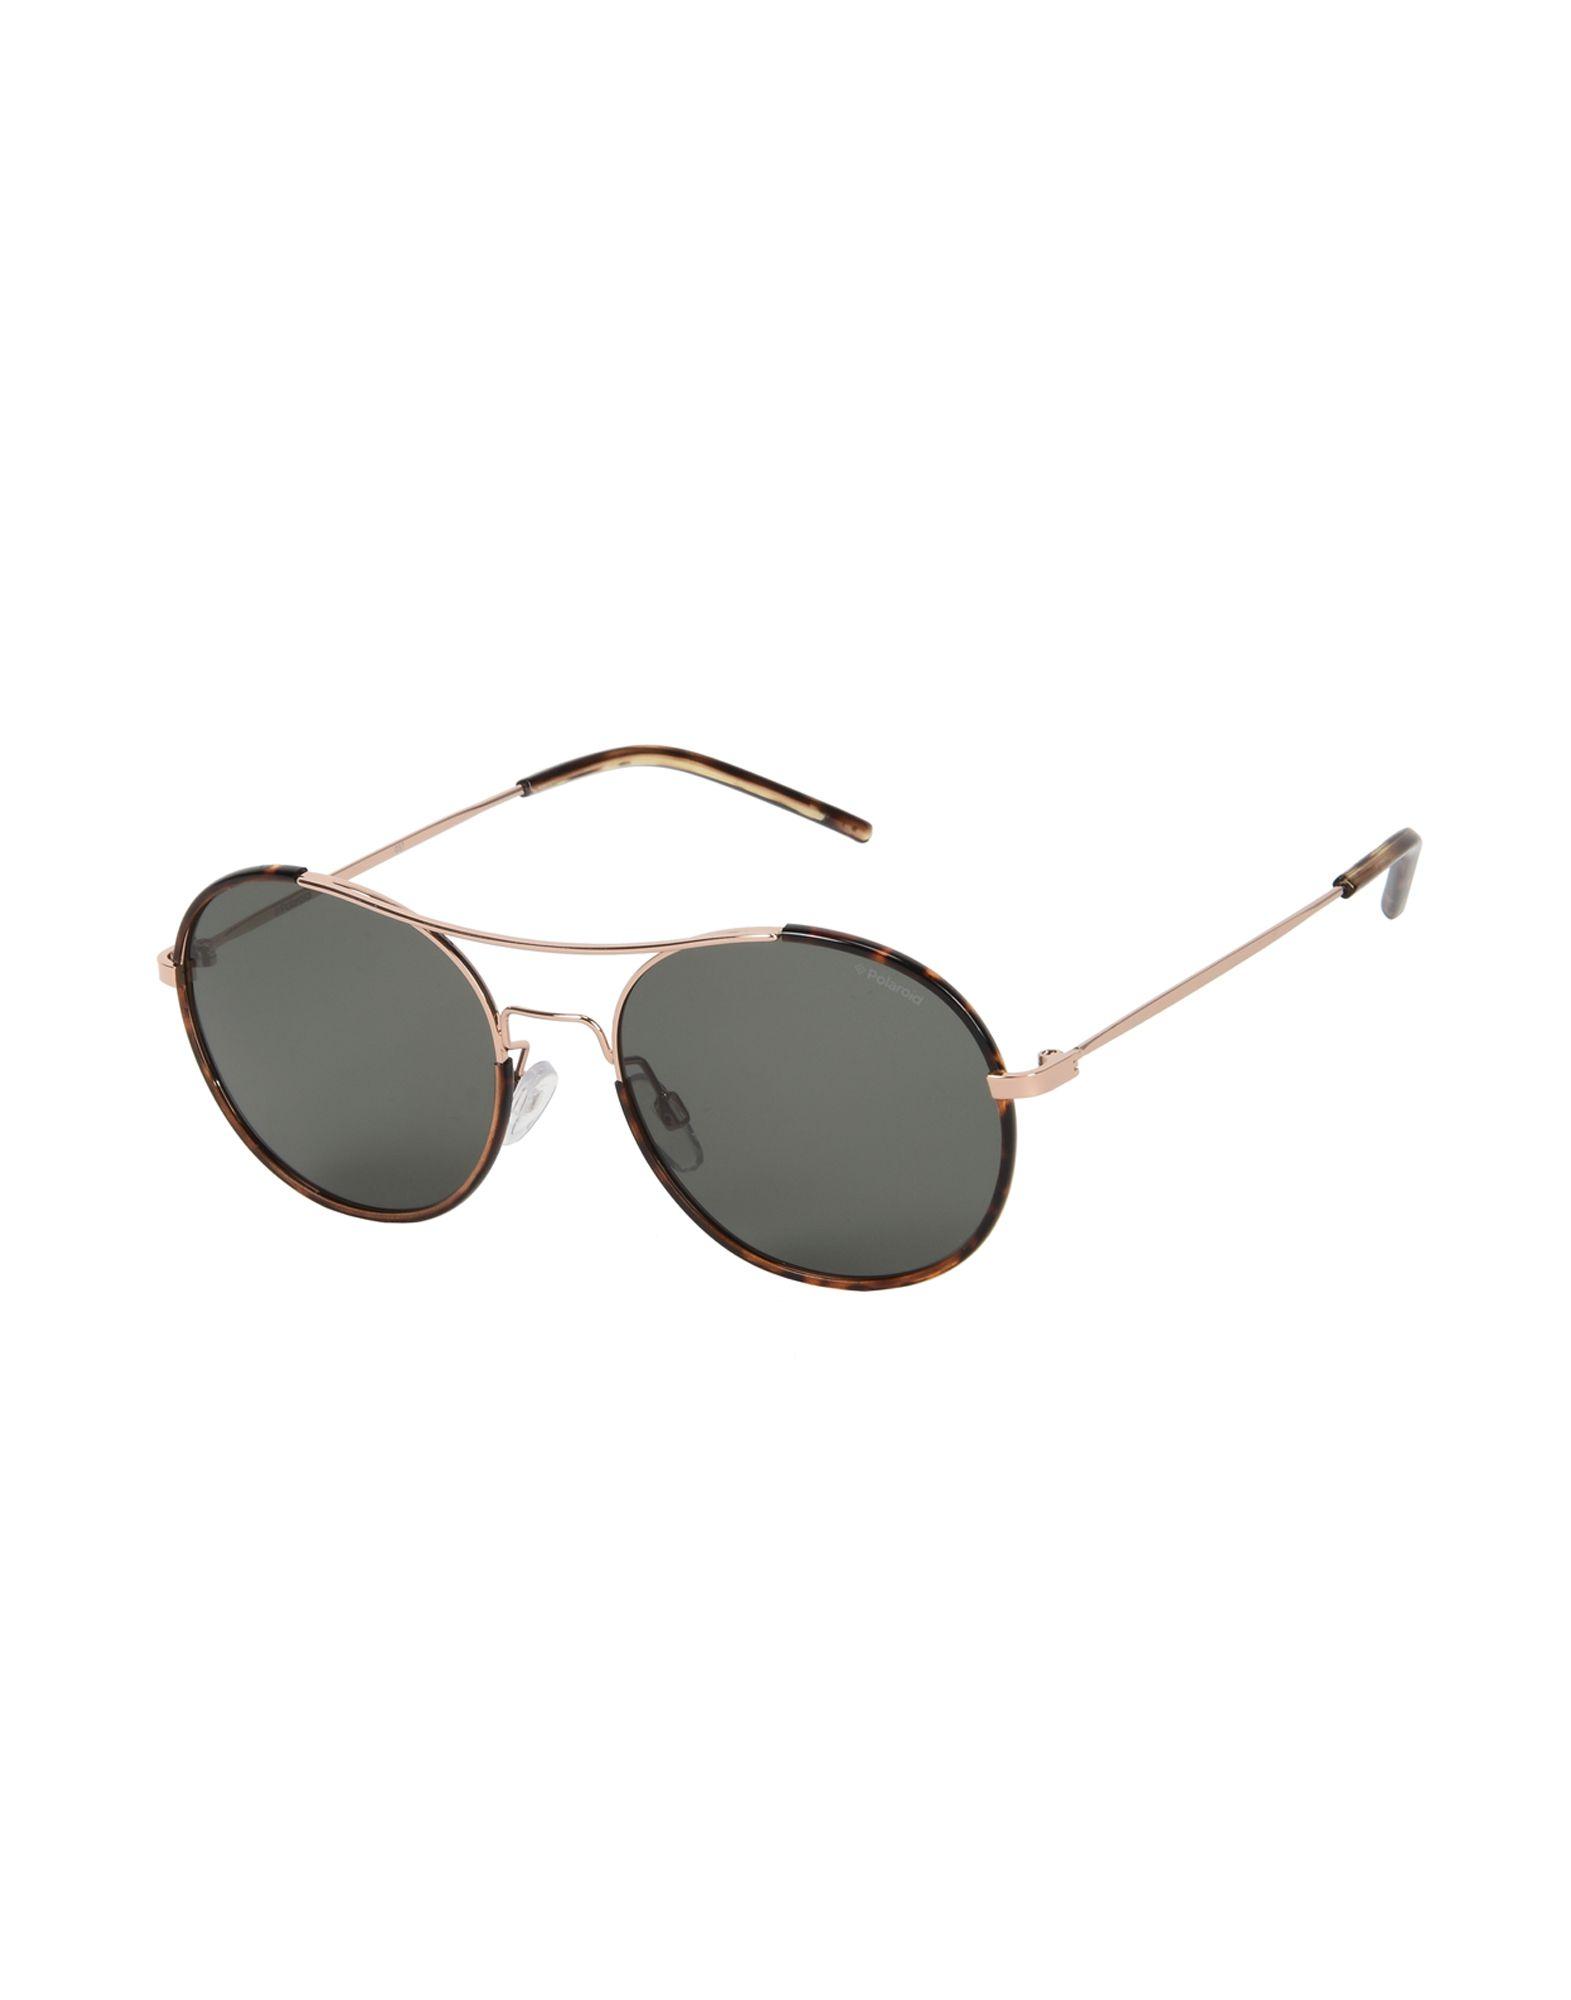 POLAROID Солнечные очки очки polaroid pld 2064 s 003